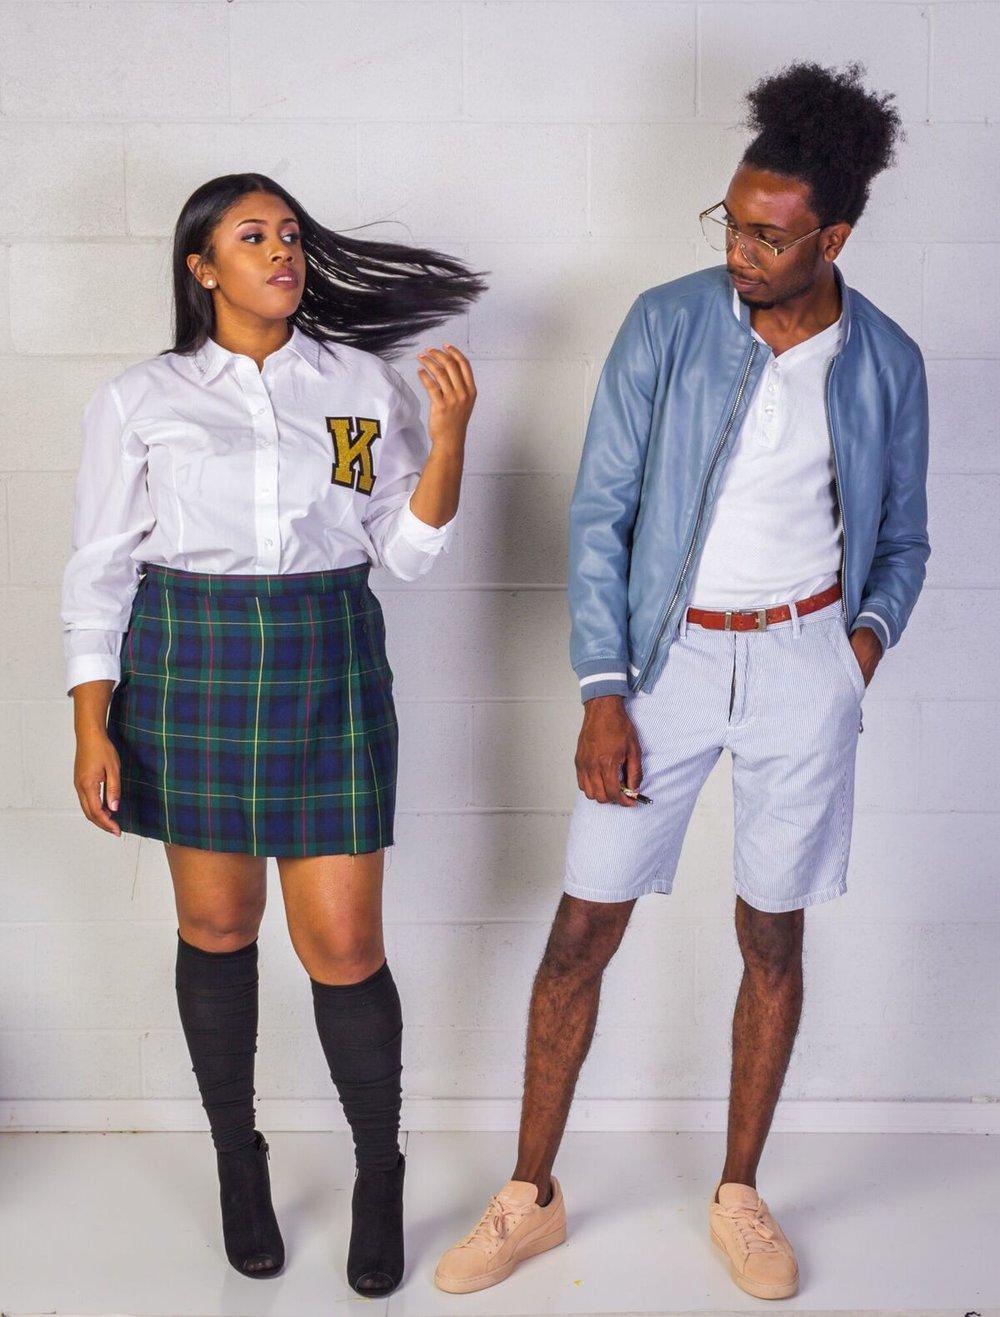 black boy preppy black girl preppy thrift outfit america's thrift store